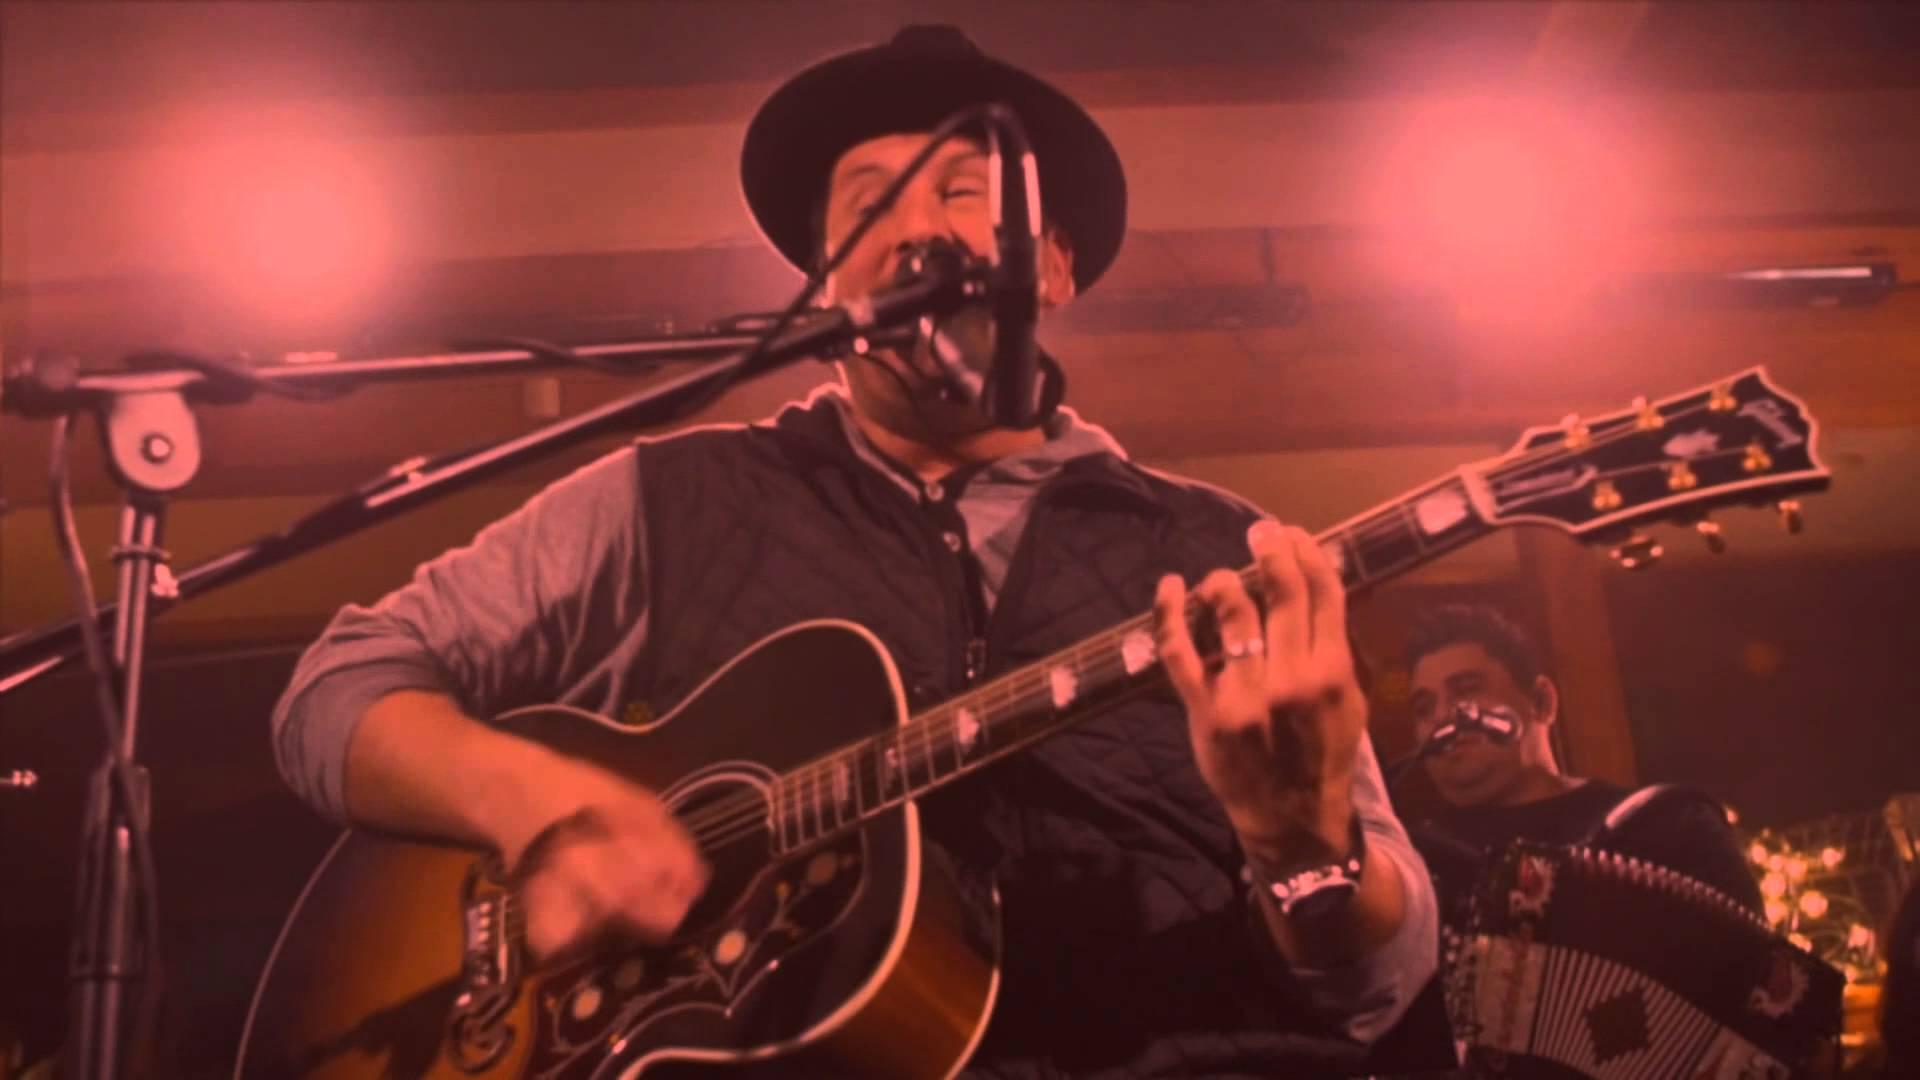 Video: Ricardo Sanchez – Halle Halle (Unplugged)